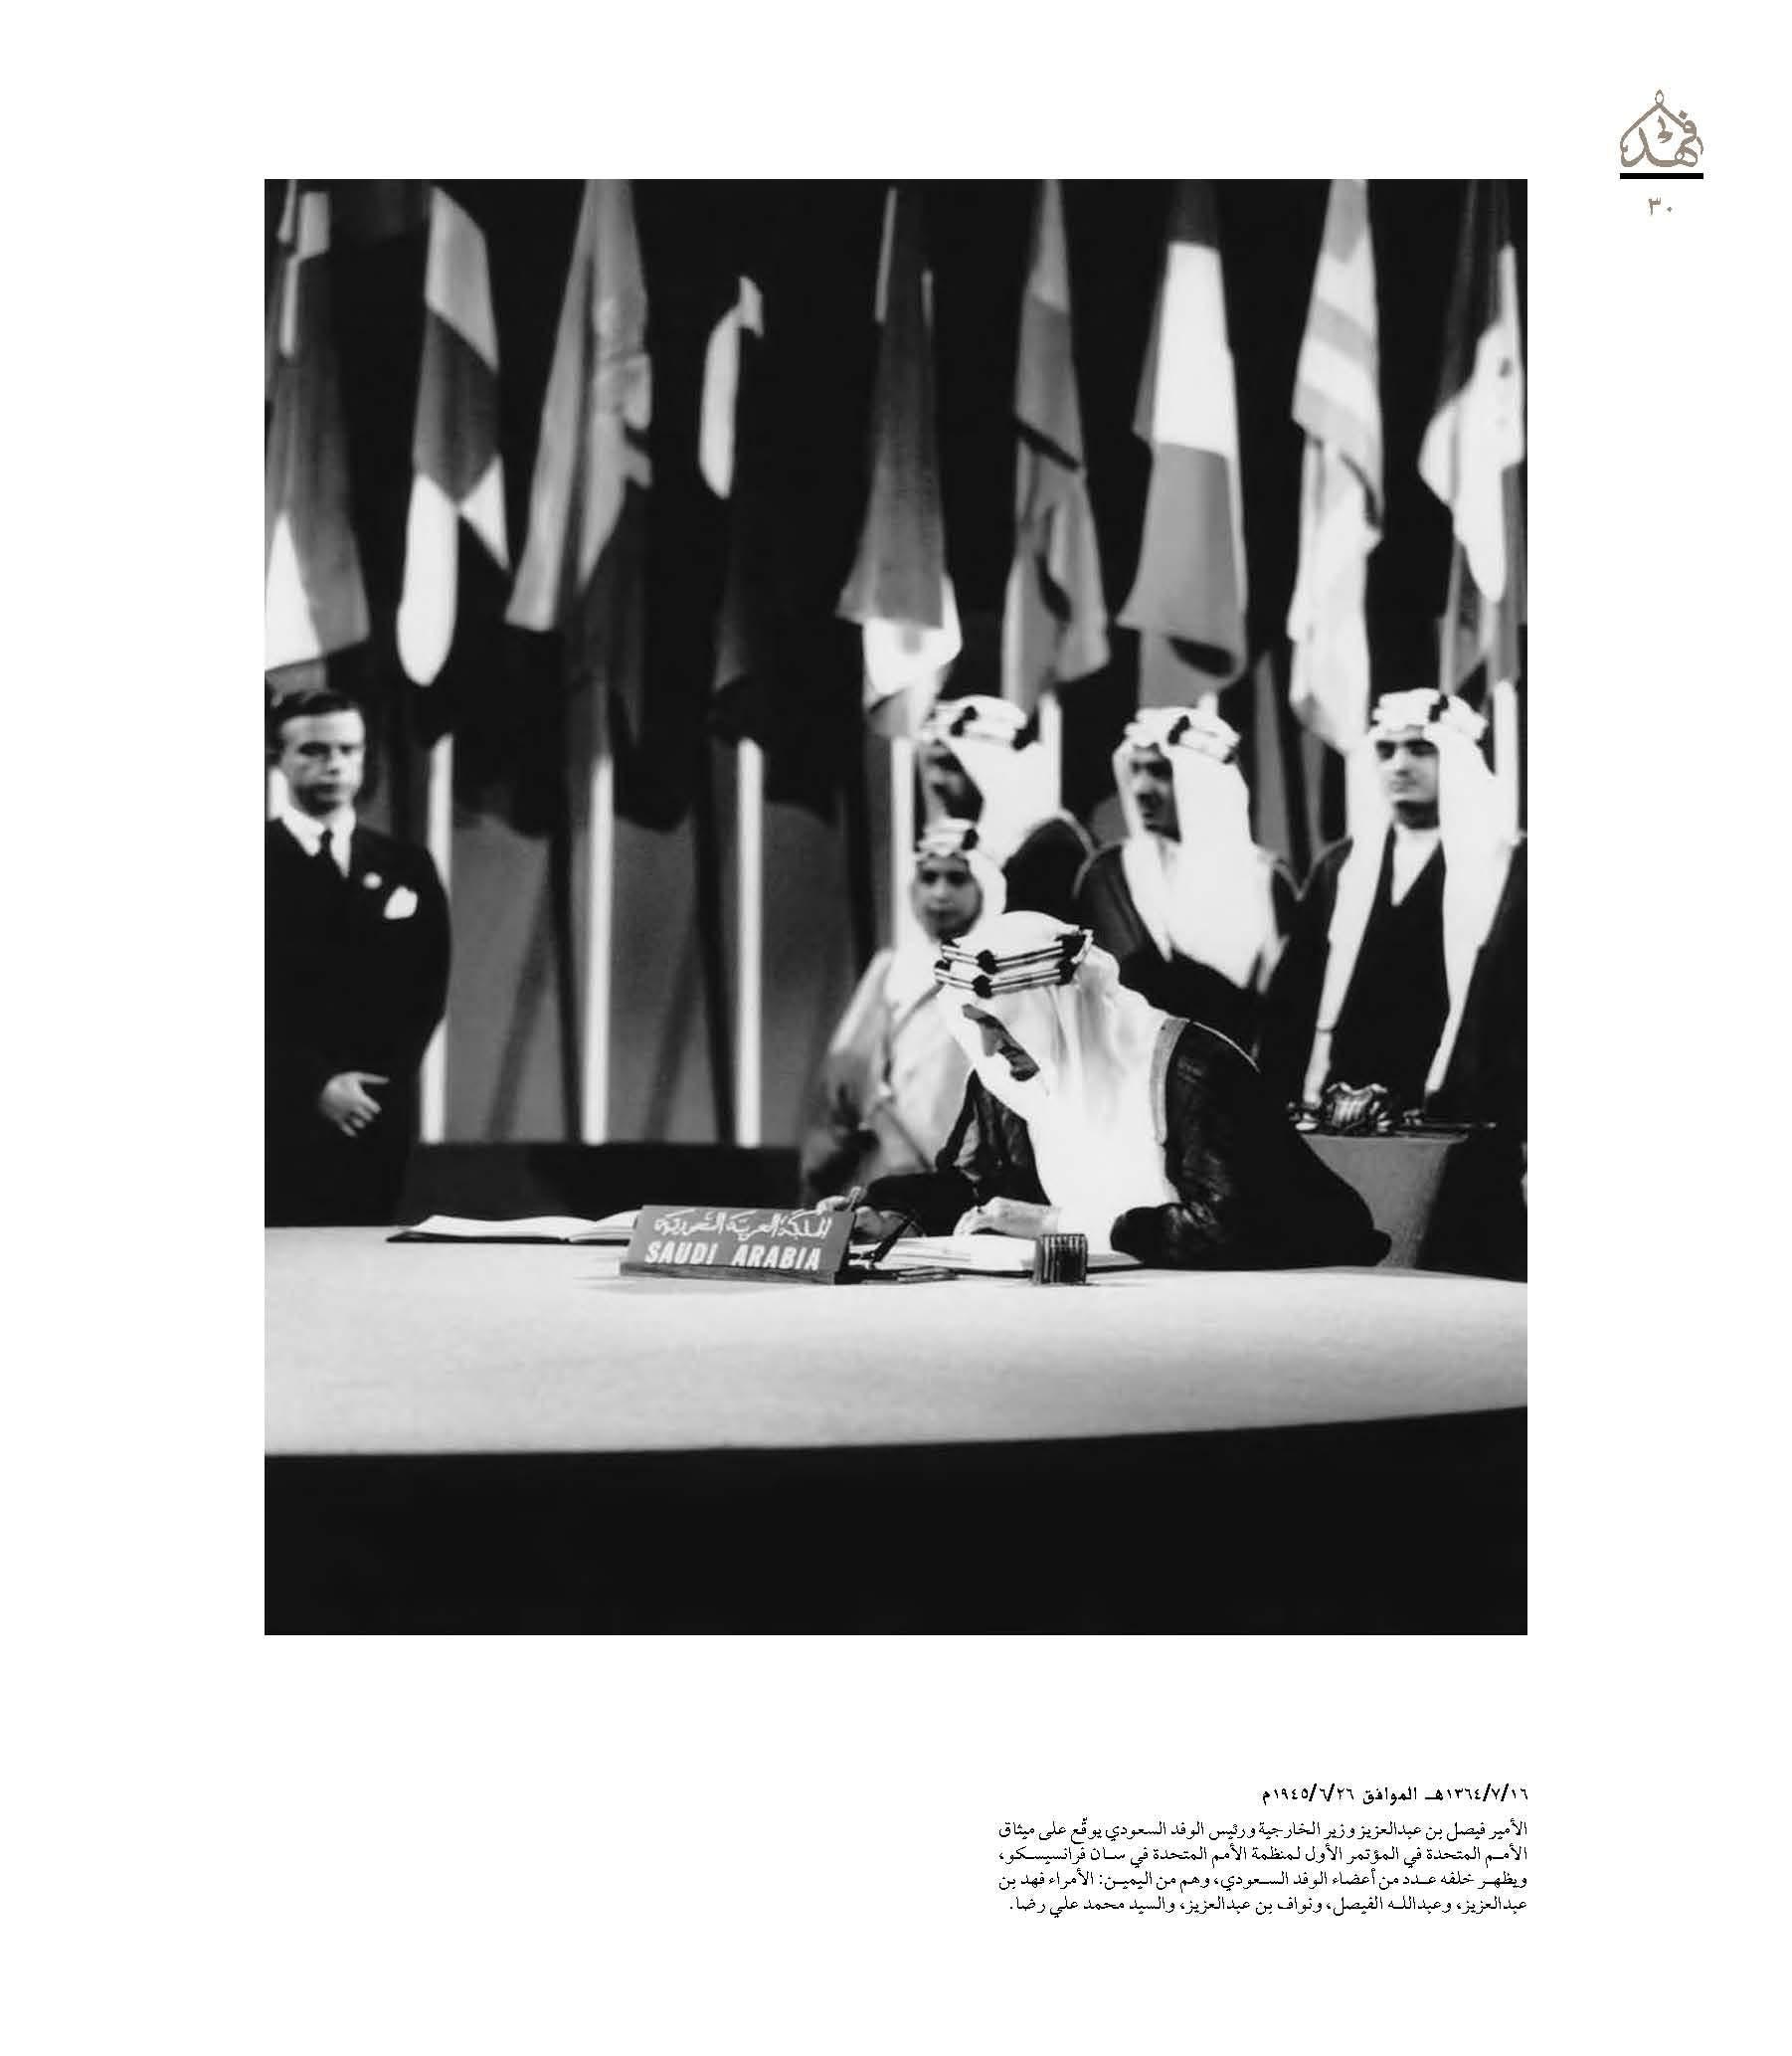 "صور نادرة للملك فهد في ""كتاب"" 523dfb6a-e7ce-4090-9860-076feddc1702"